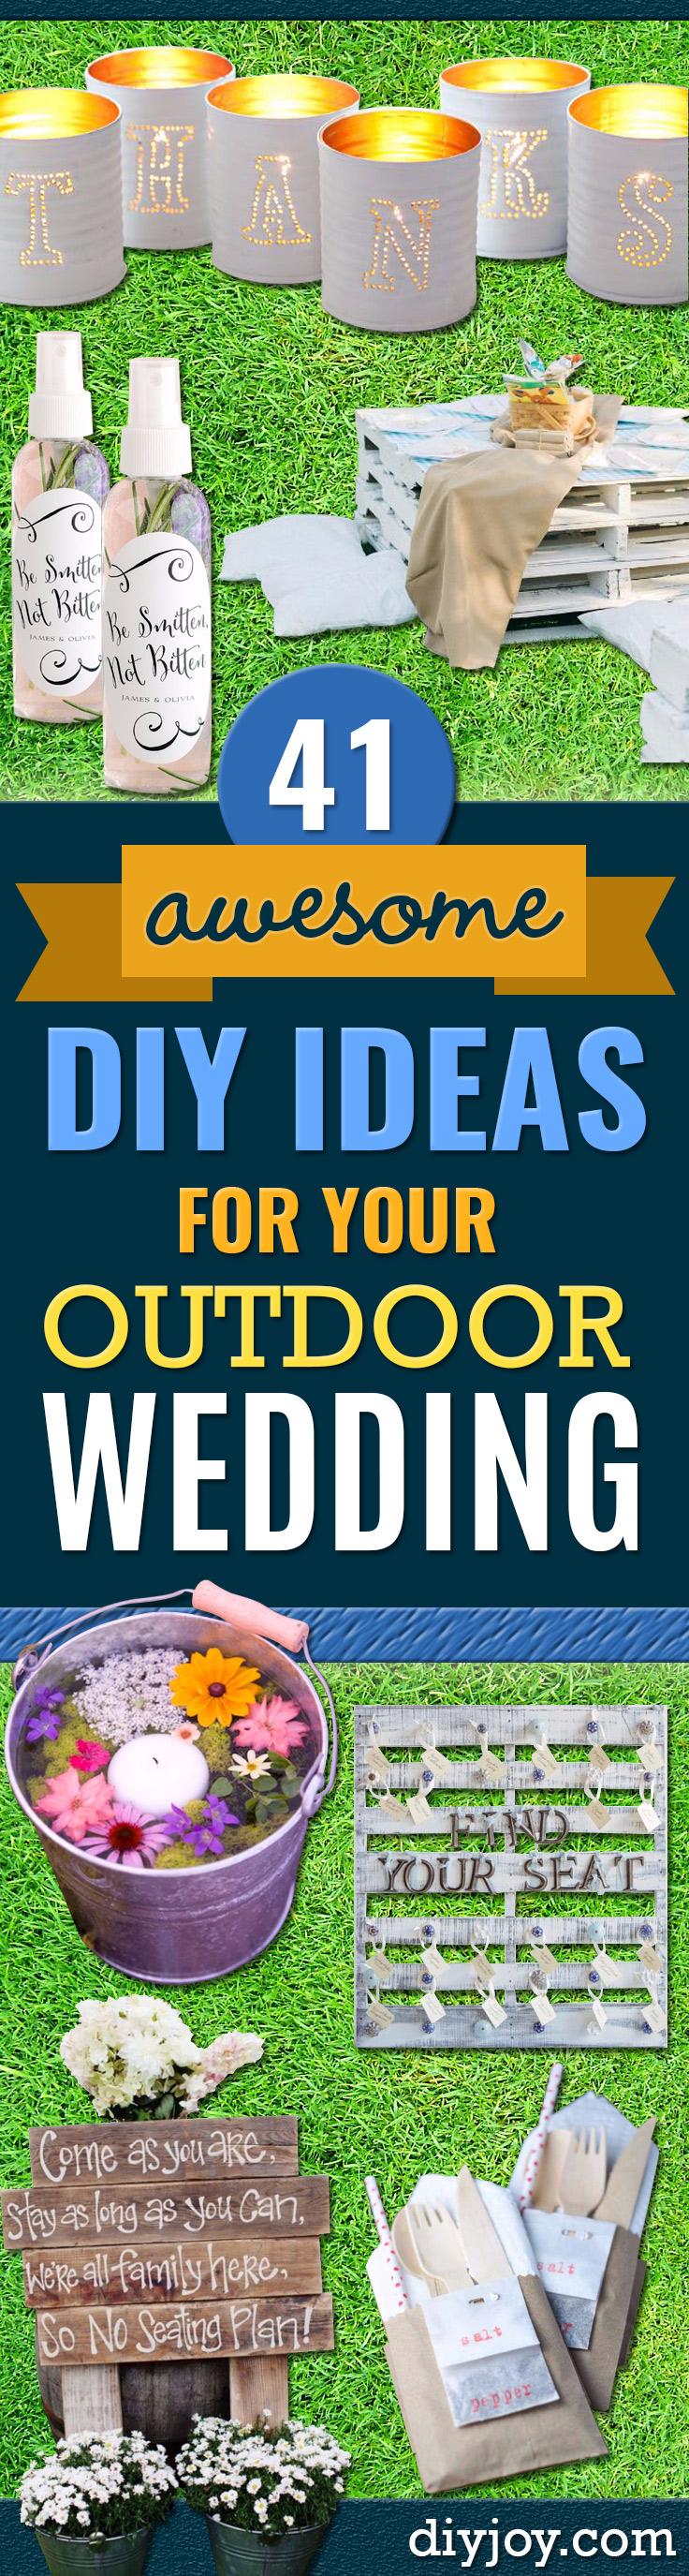 diy outdoor wedding ideas - summer wedding idea diy Lighting, Mason Jar Centerpieces, Table Decor, Party Favors, Guestbook Ideas, Signs, Flowers #weddings #diy